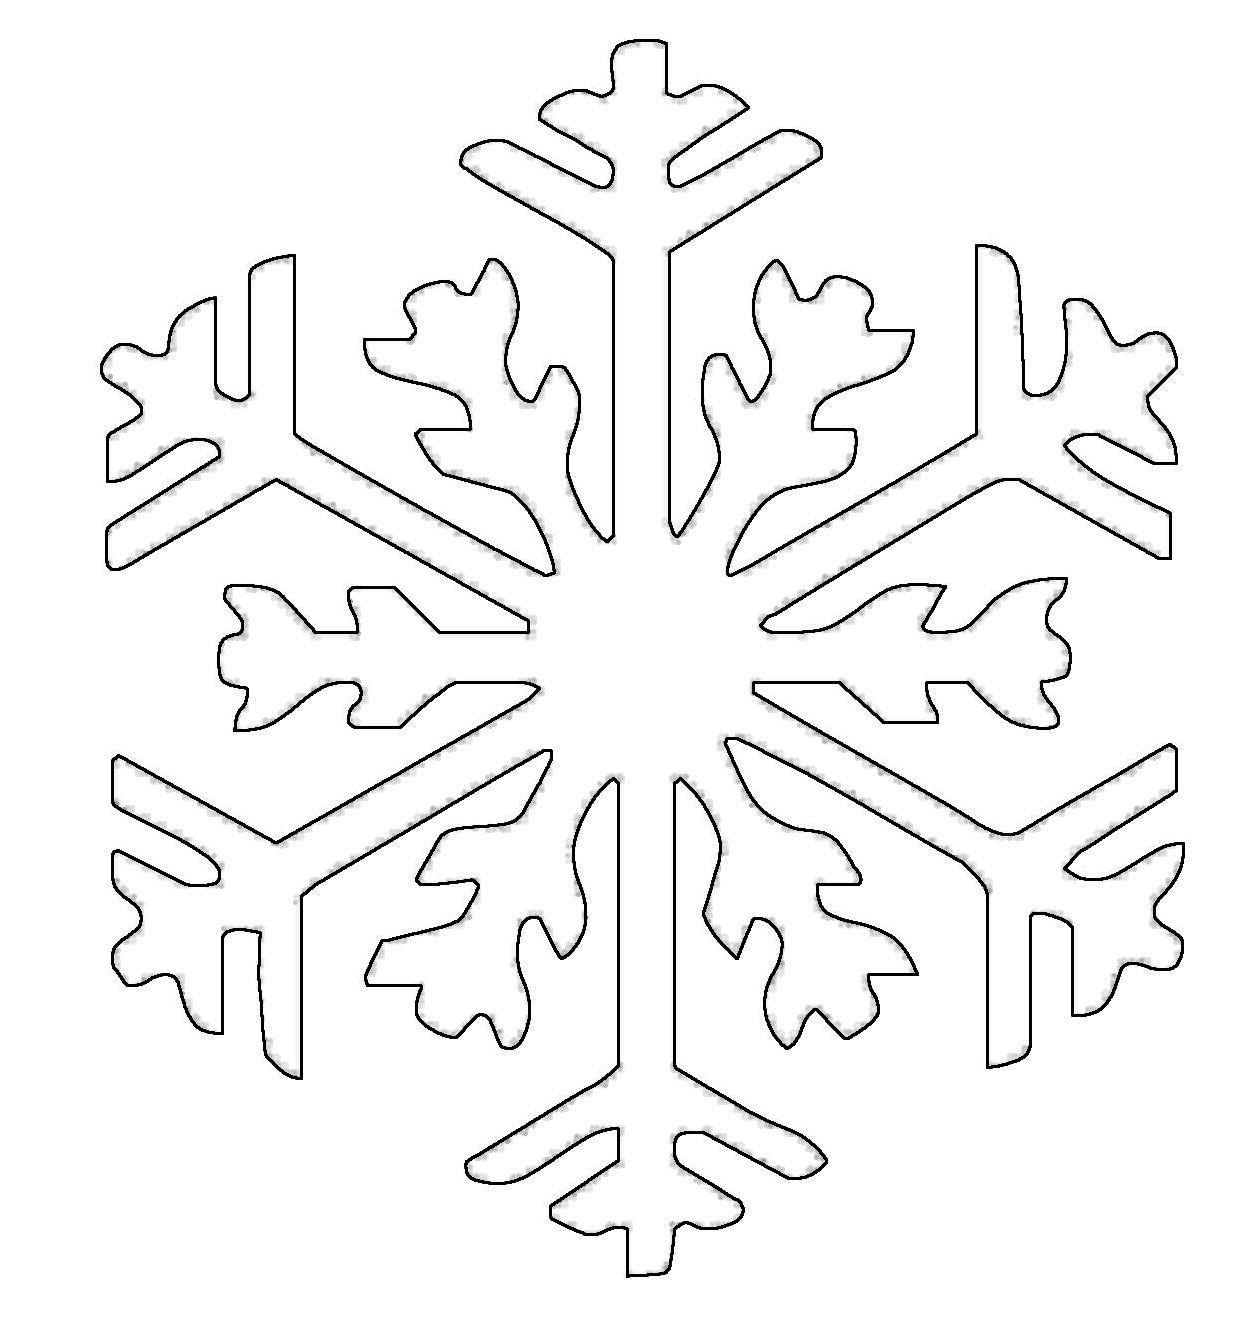 Risultati immagini per schneeflocke ausmalbild | Ünnepek | Pinterest ...